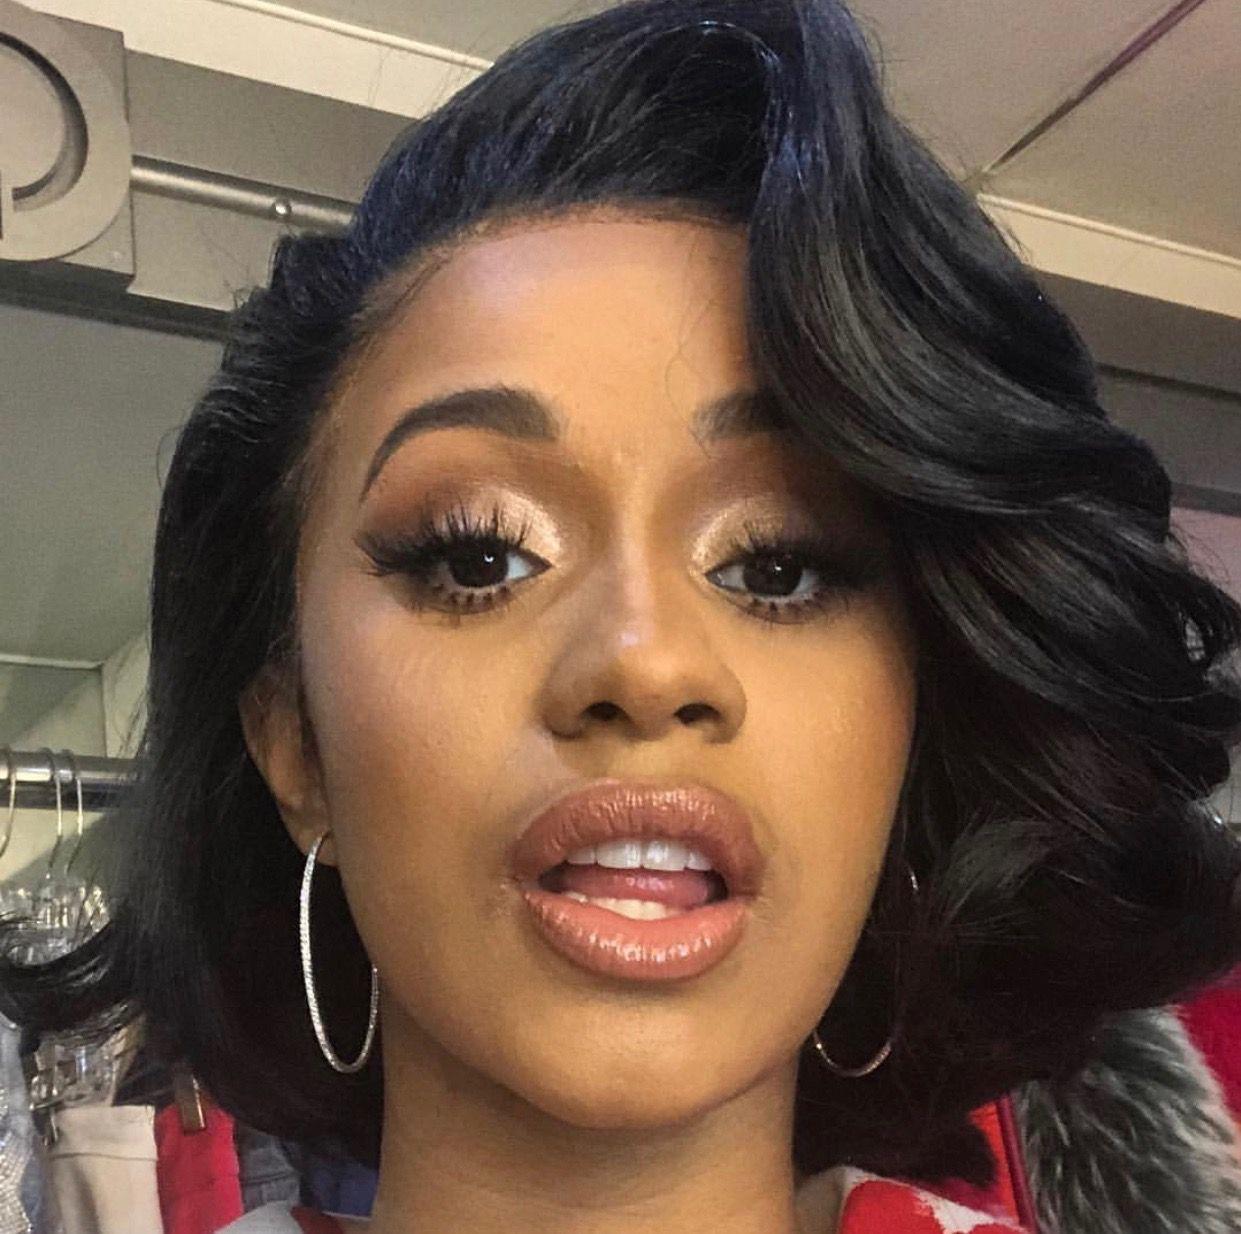 Cardi Follow Annika Grant Bardi Gang In 2019 Cardi B Hairstyles